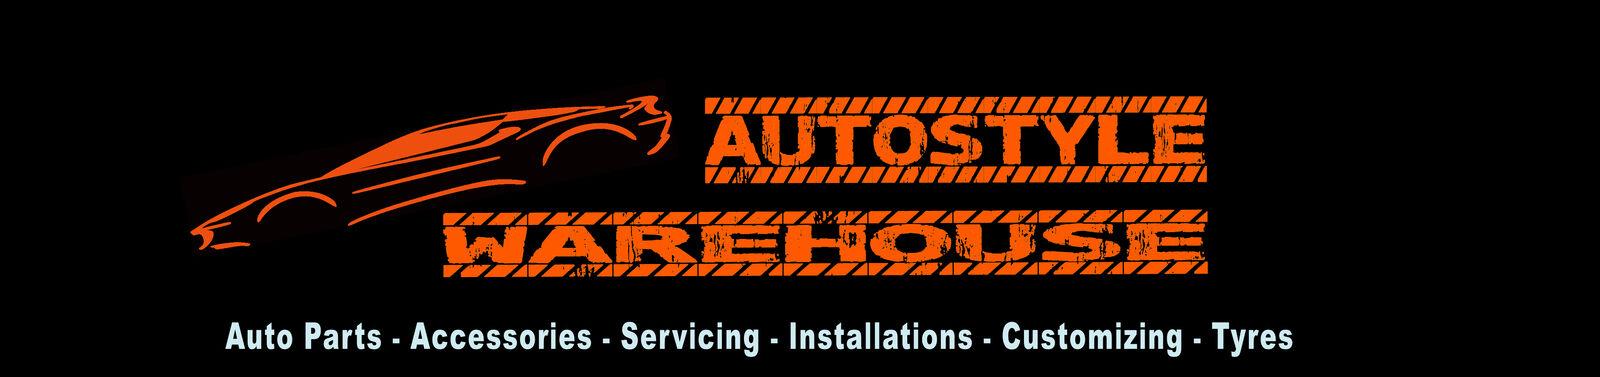 autostyle-warehouse